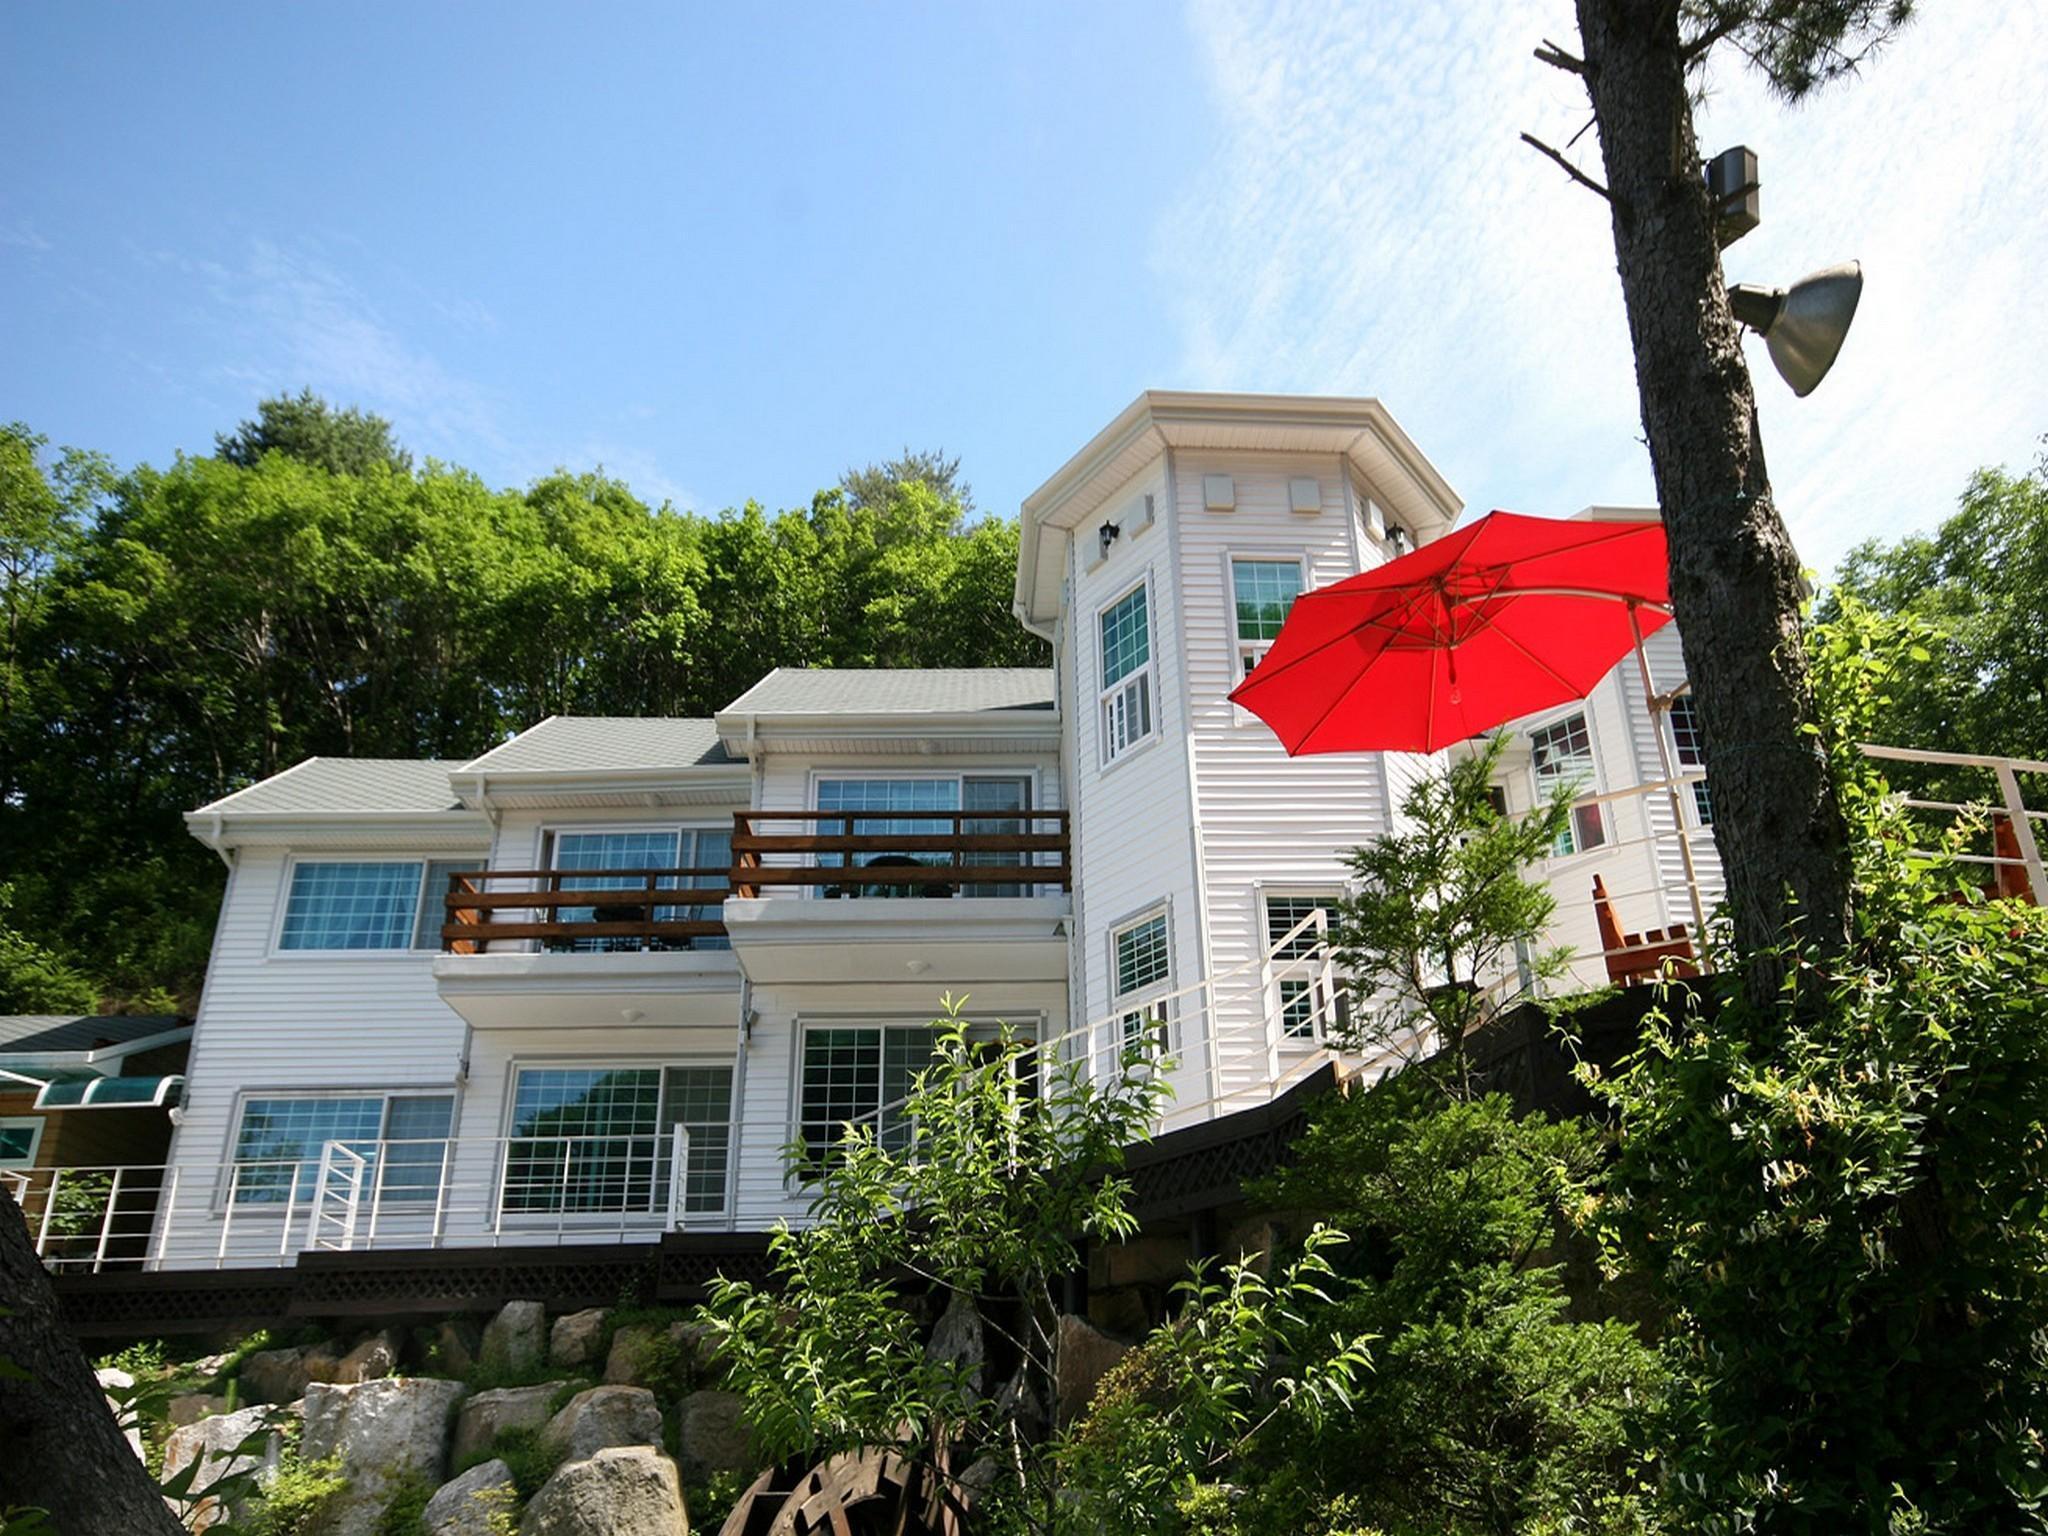 Hwacheon whitehill House - 4204 Reviews